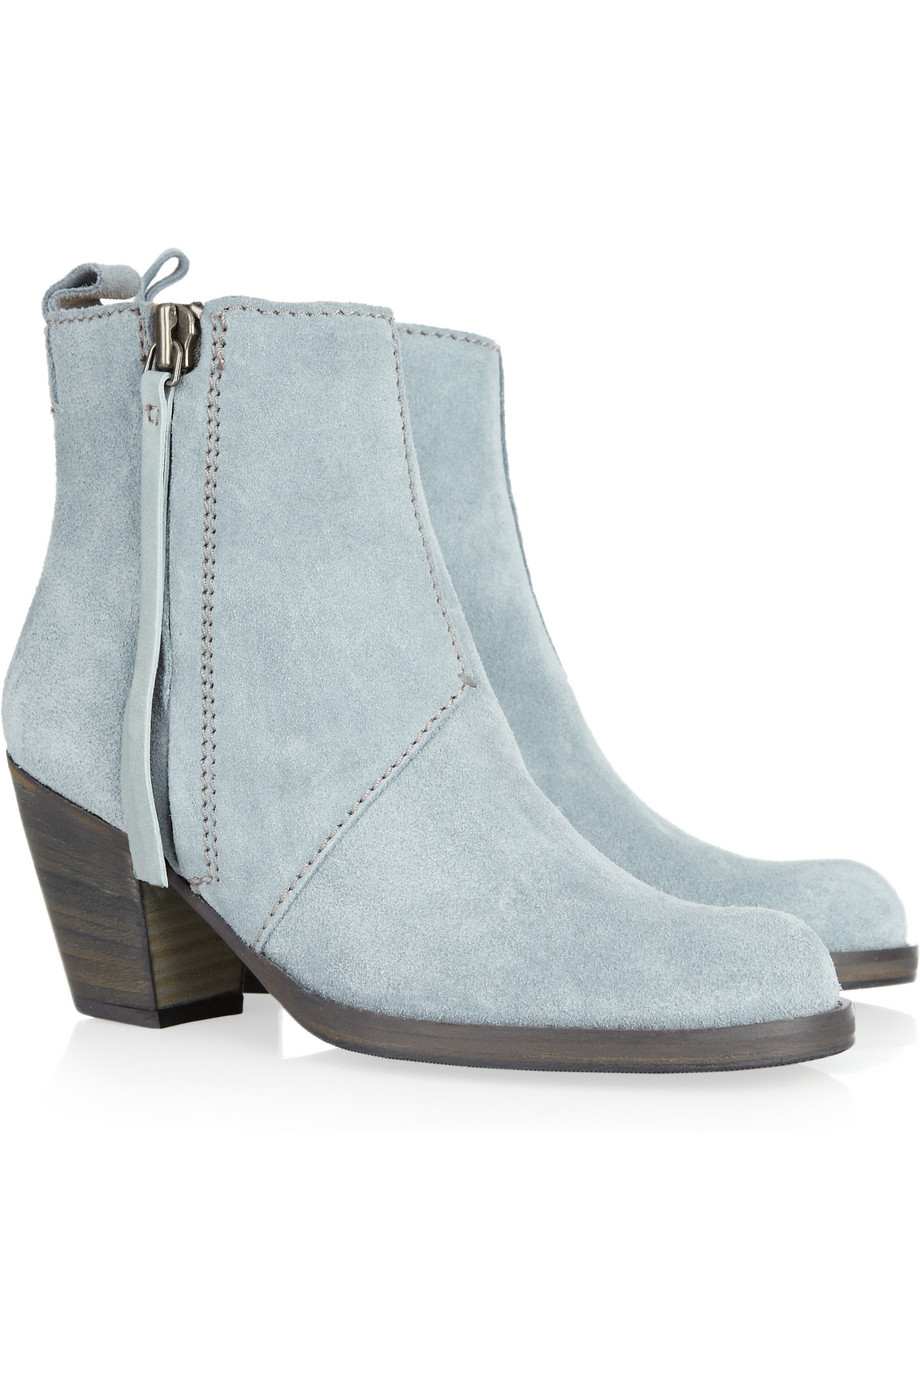 96d4ace927c56 Acne Studios Pistol Suede Ankle Boots in Blue - Lyst